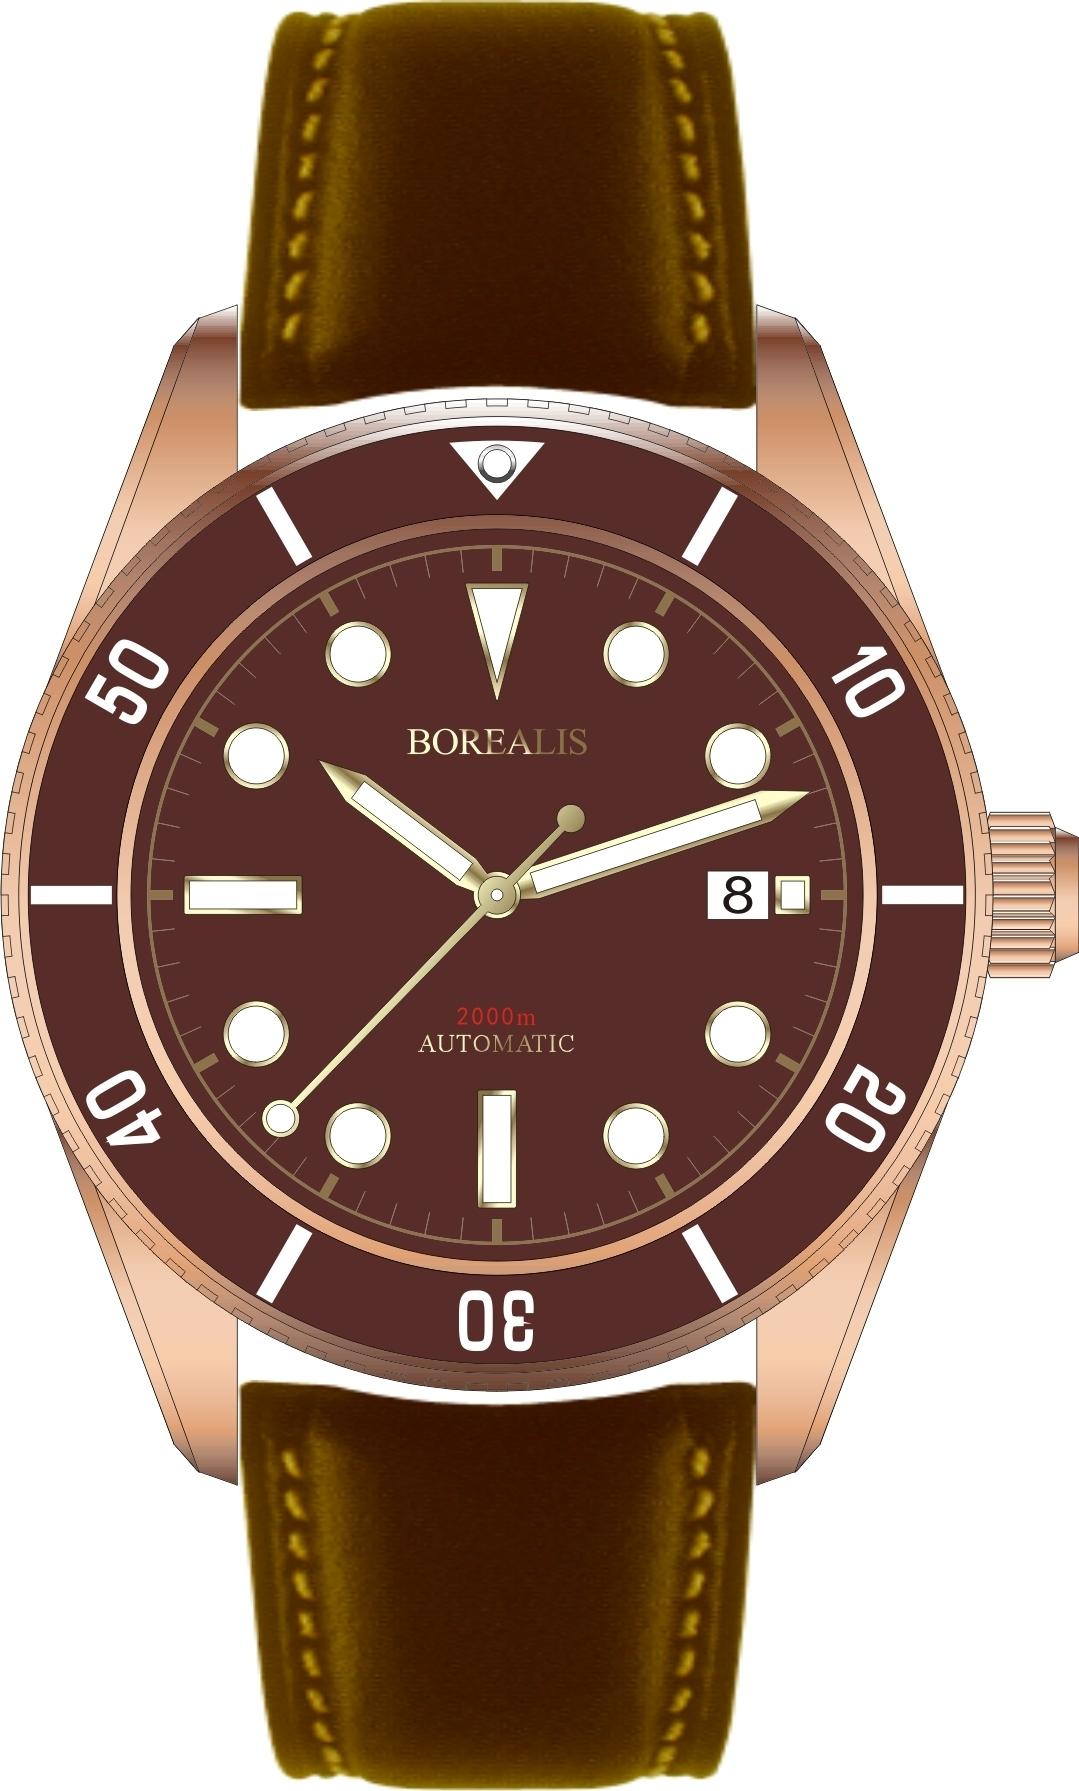 Pre-Order Borealis Bull Shark Bronze CuSn8 Automatic Diver Watch Date Miyota 9015 Ceramic Brown Bezel Bezel Brown Dial BBSBRONZEBROWNDATE